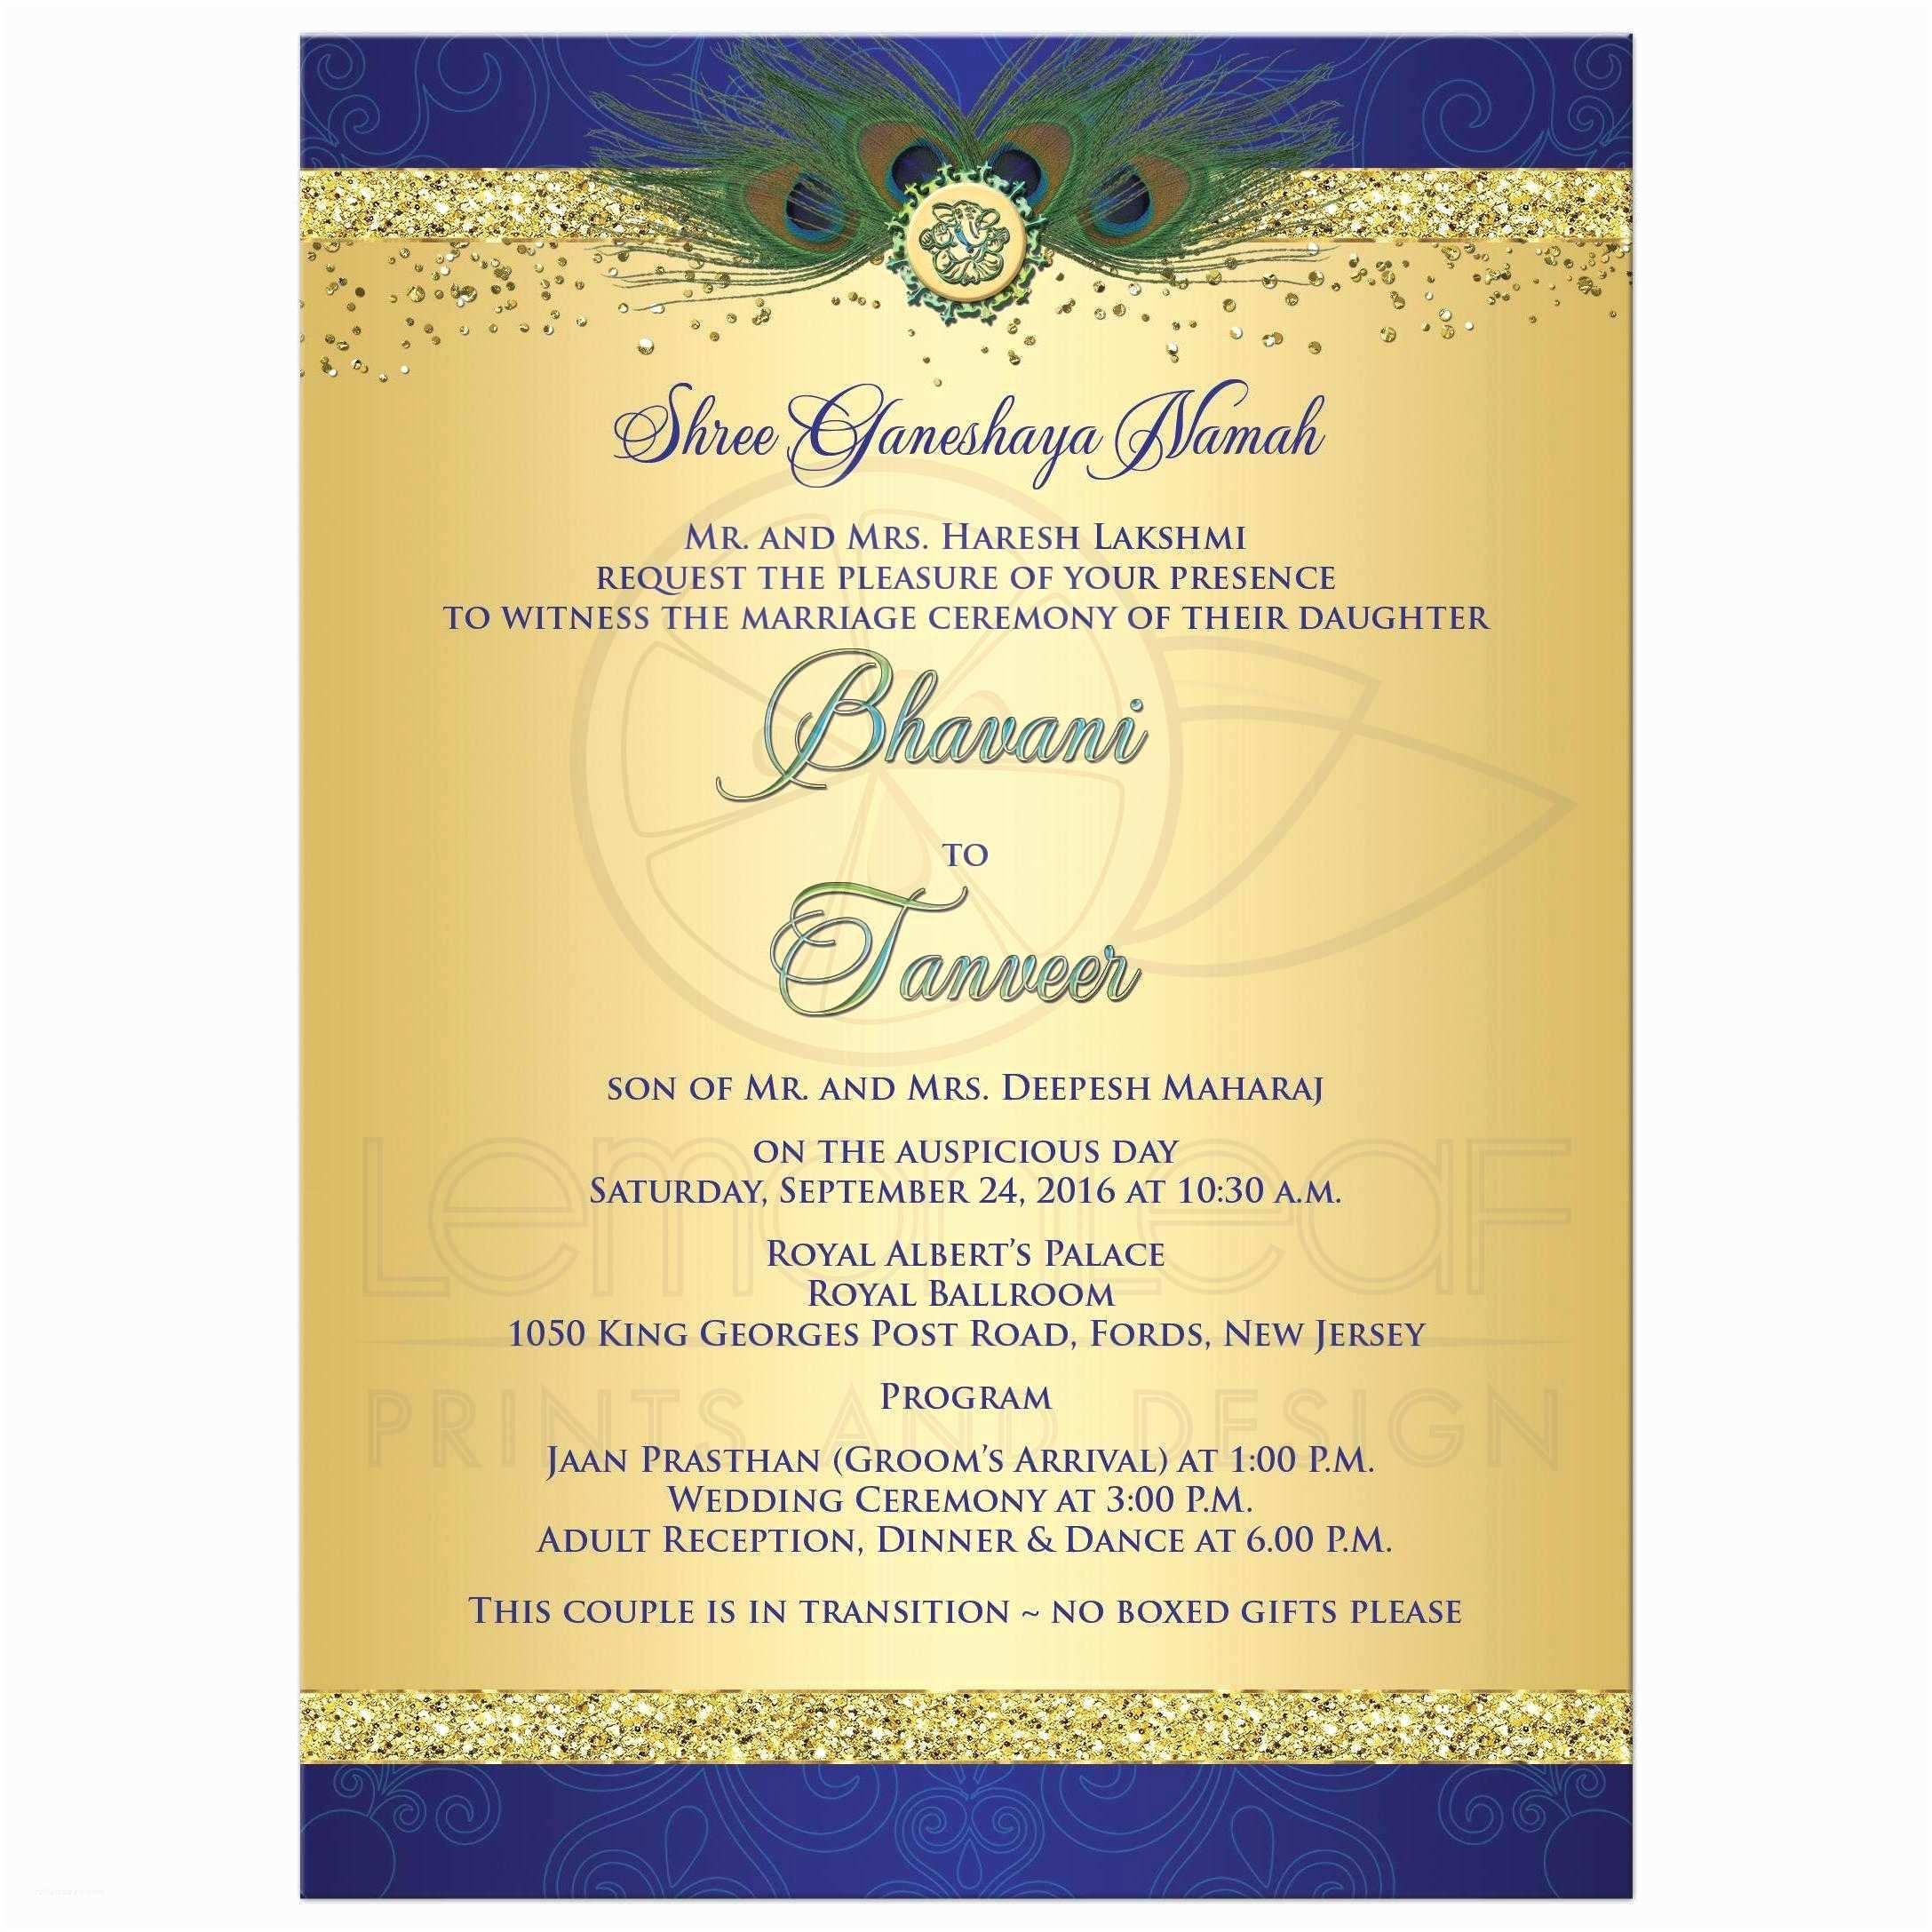 Wedding Invitation Name order Indian Wedding Invitation Cards Indian Wedding